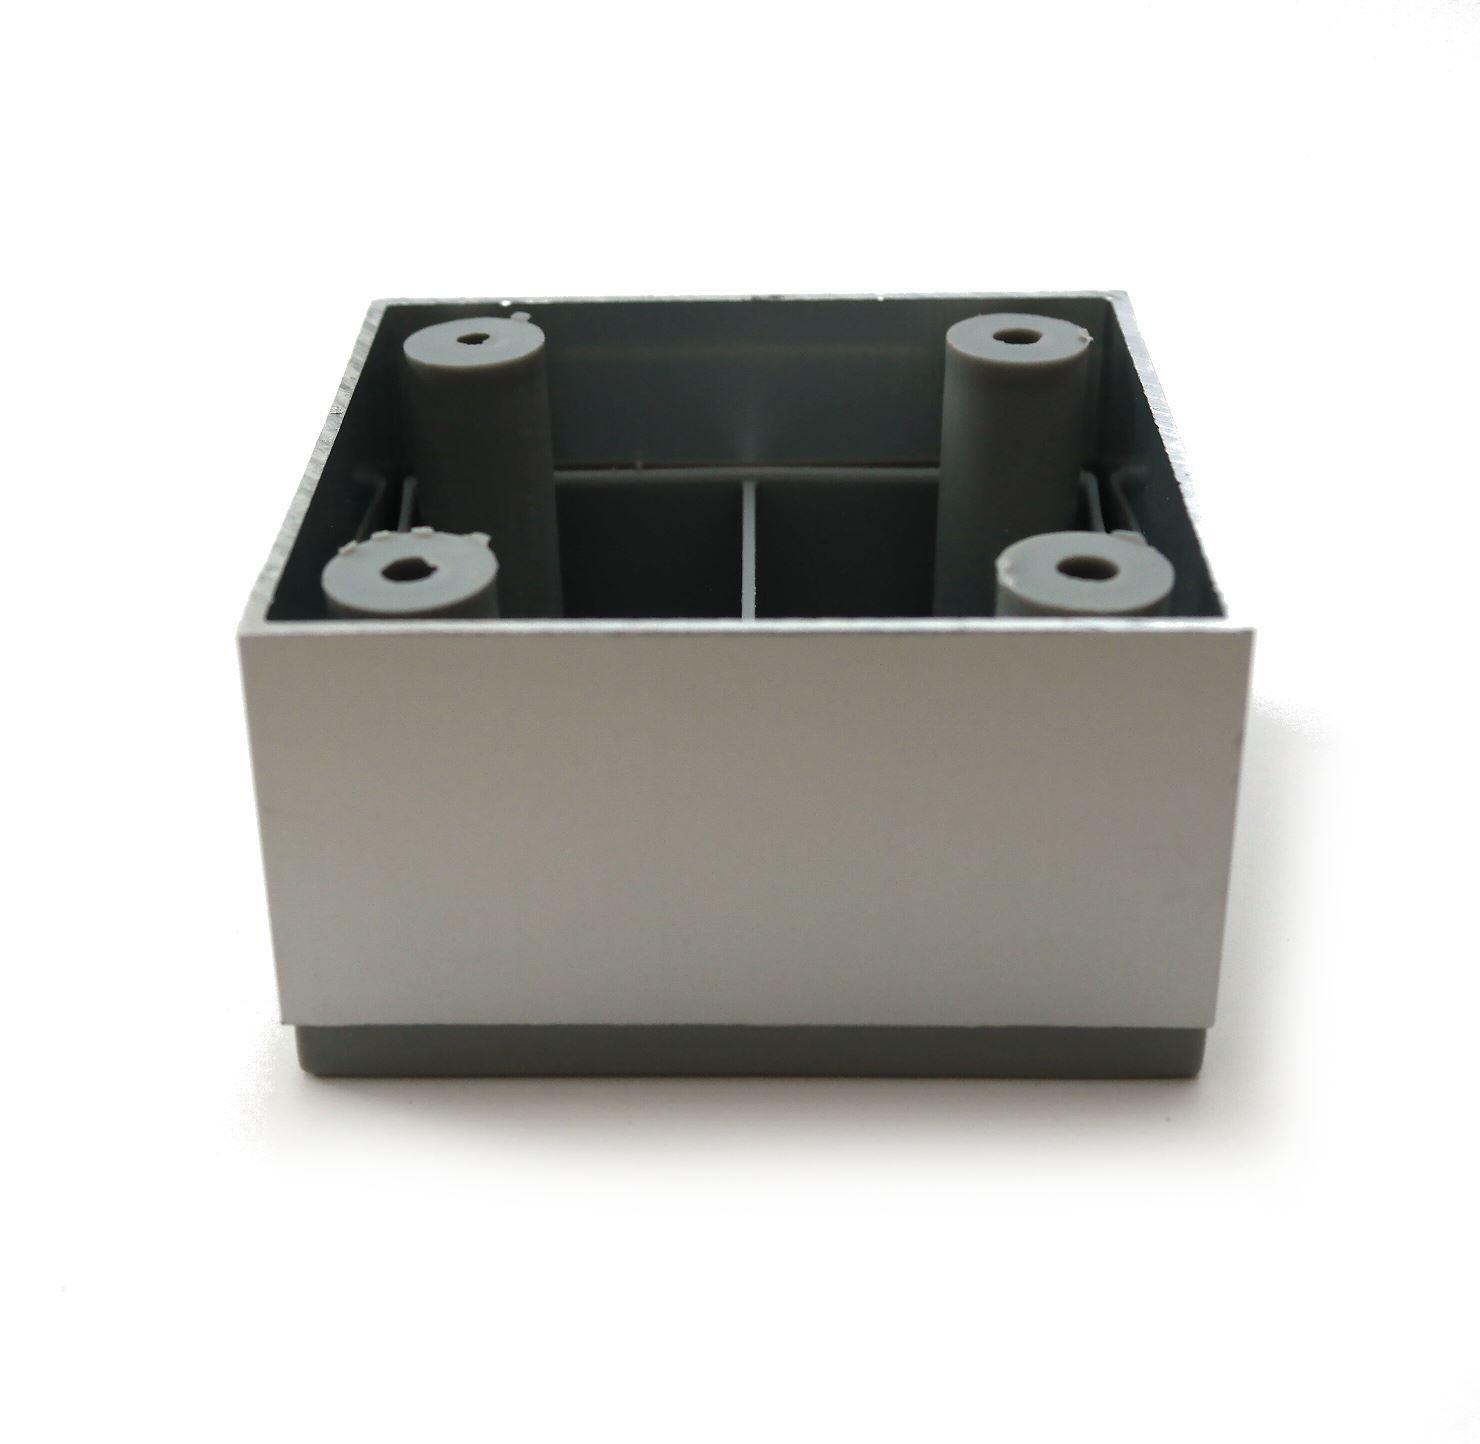 Aluminium f e beine schr nke schlafsofa k che m bel chrom 25mm 35mm ebay - Amazon mobel schranke ...